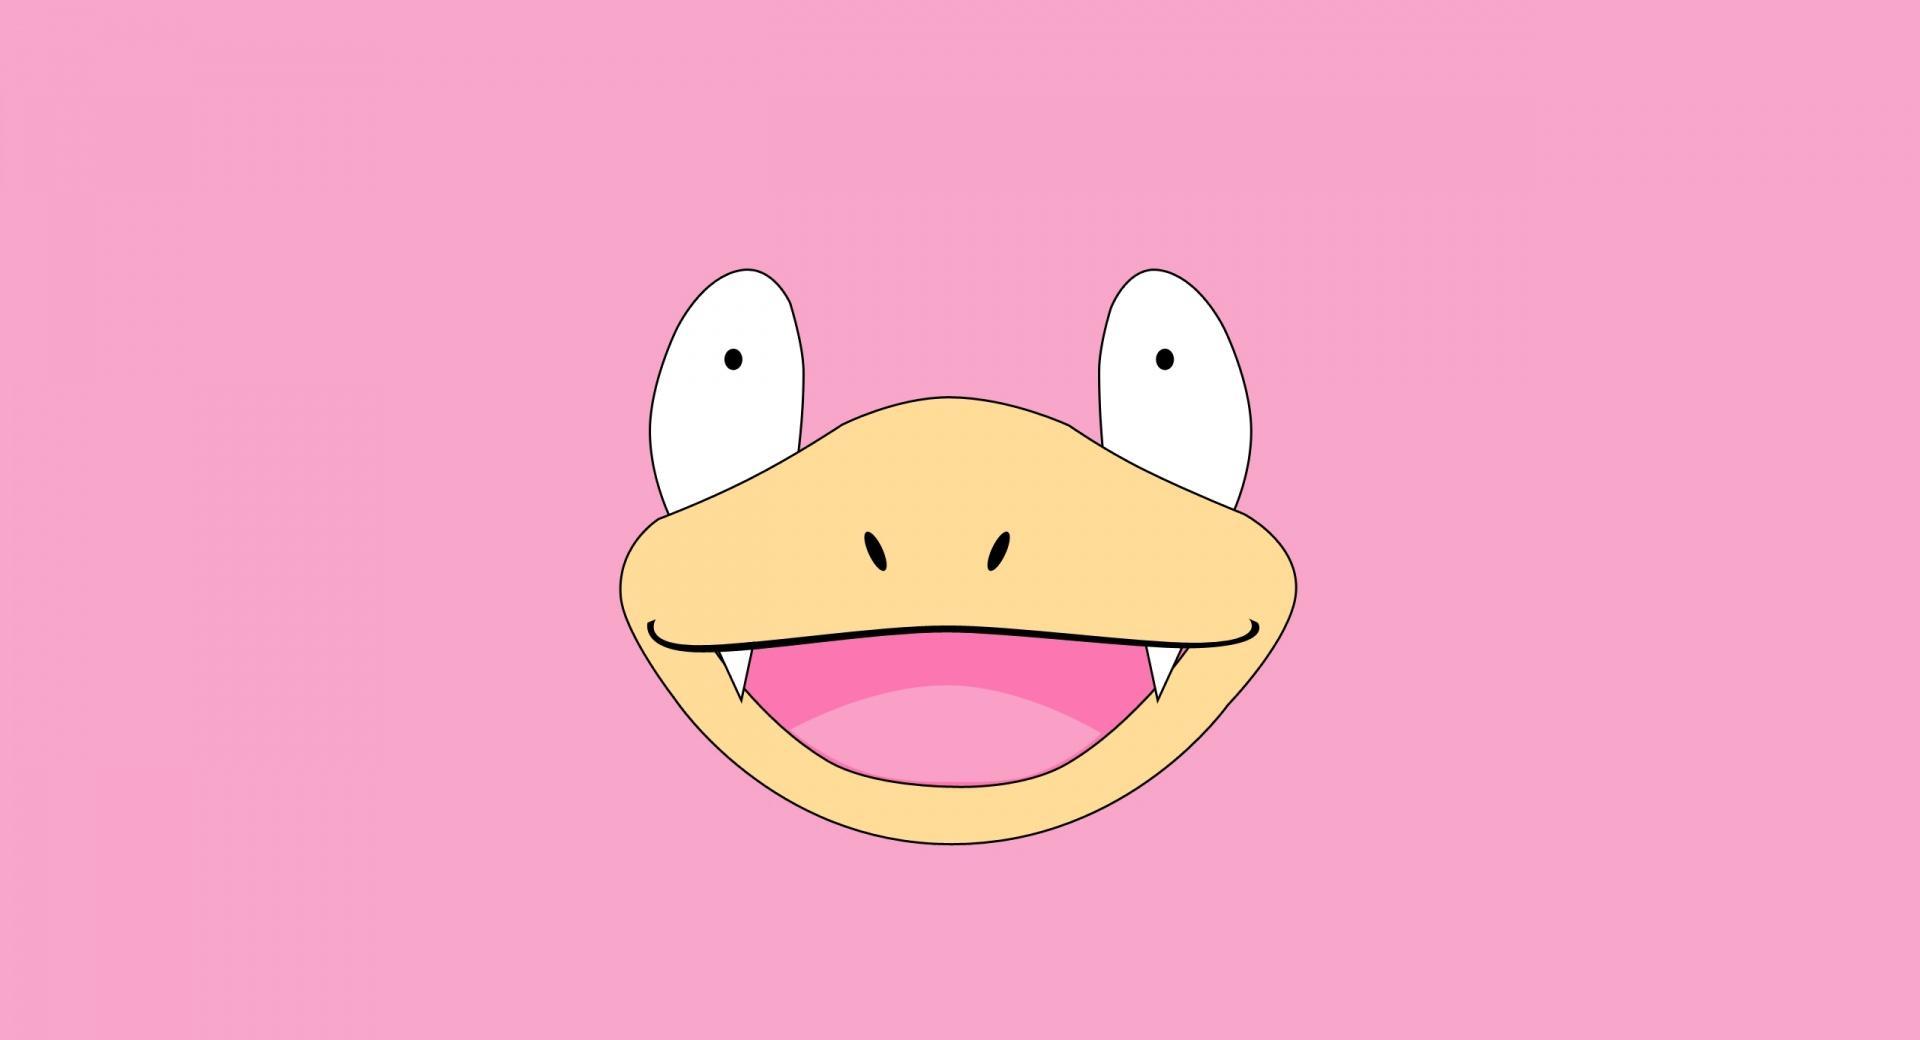 Slowpoke Face (Pokemon) wallpapers HD quality